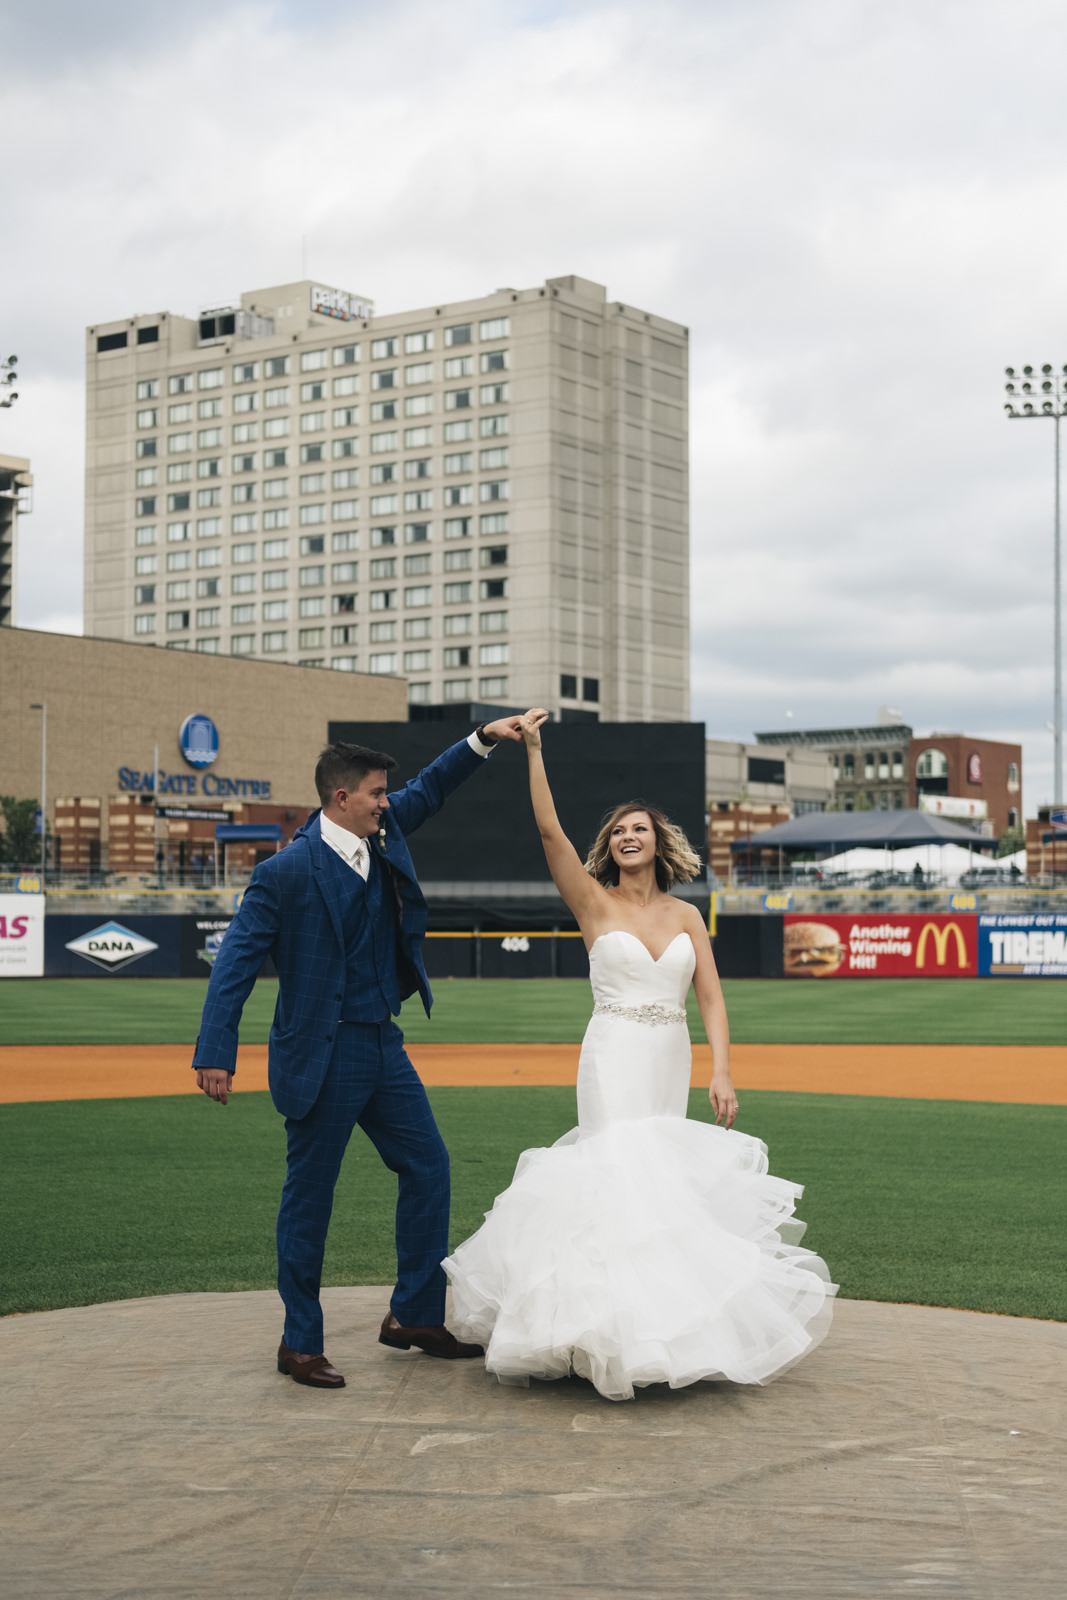 Bride and groom wedding photography in the Toledo Mudhens Stadium.